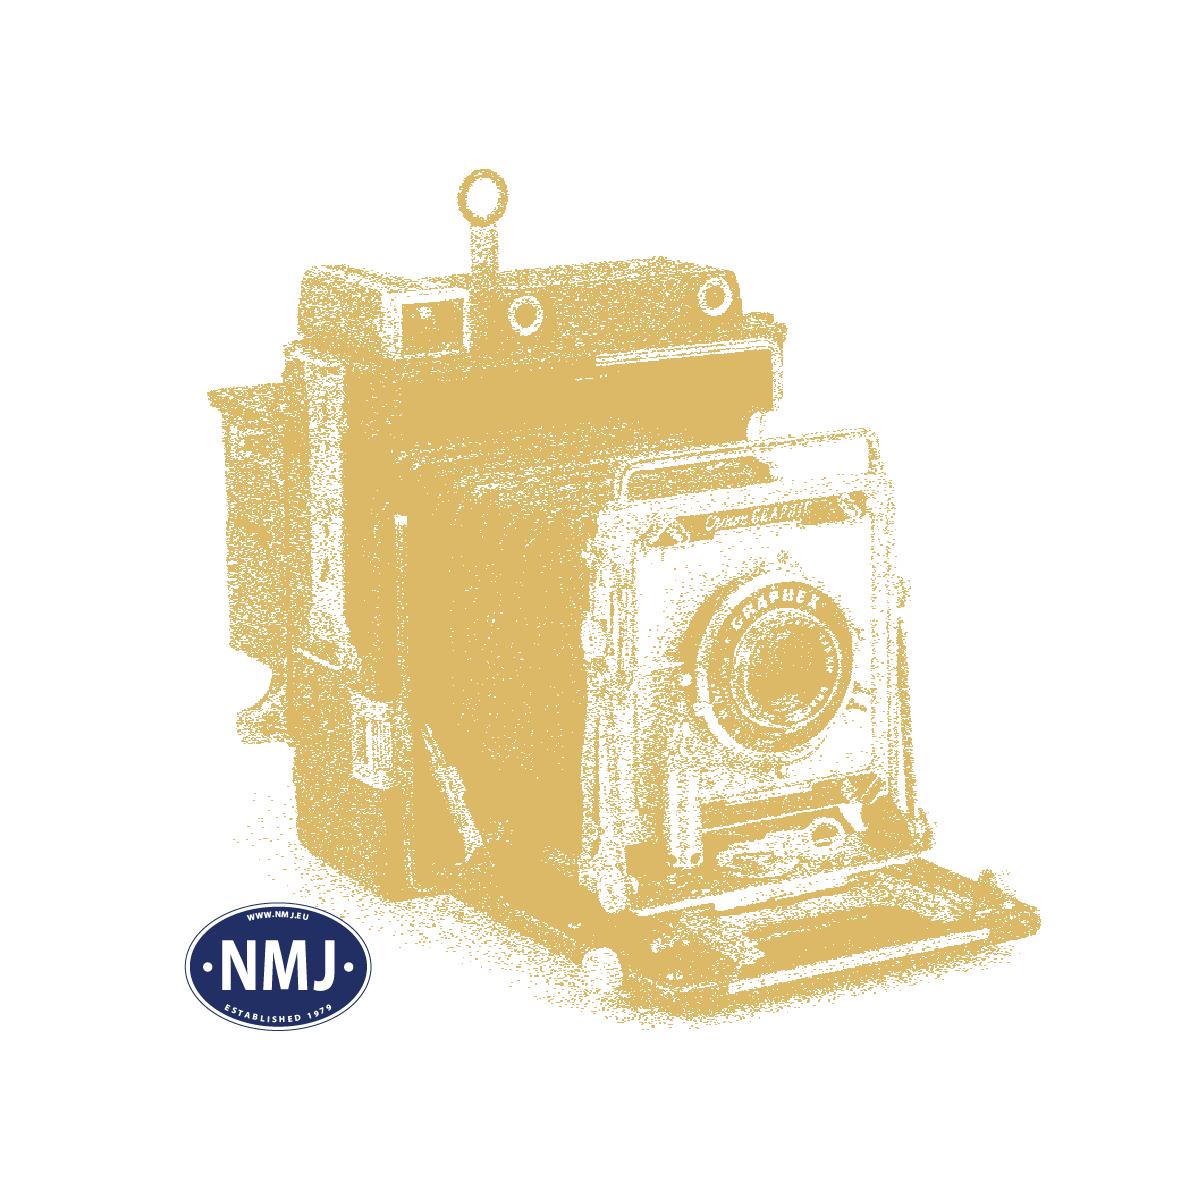 NMJT145302 - NMJ Topline CFL 1603, 0-Scale, DC